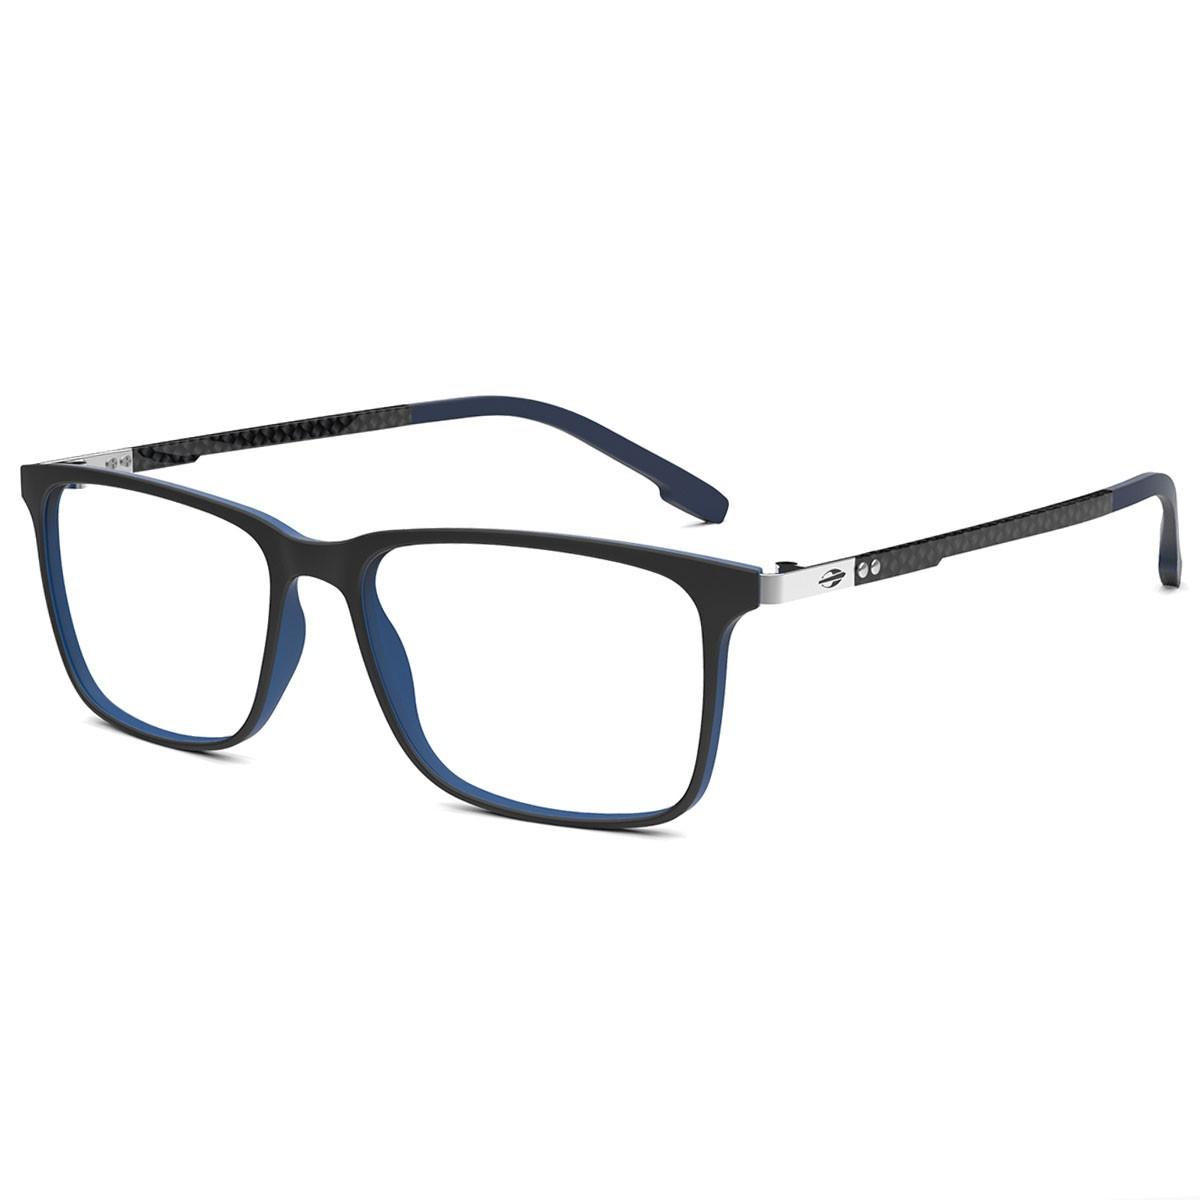 Óculos de Grau Masculino Mormaii Argel M6079AA355 Tam.55